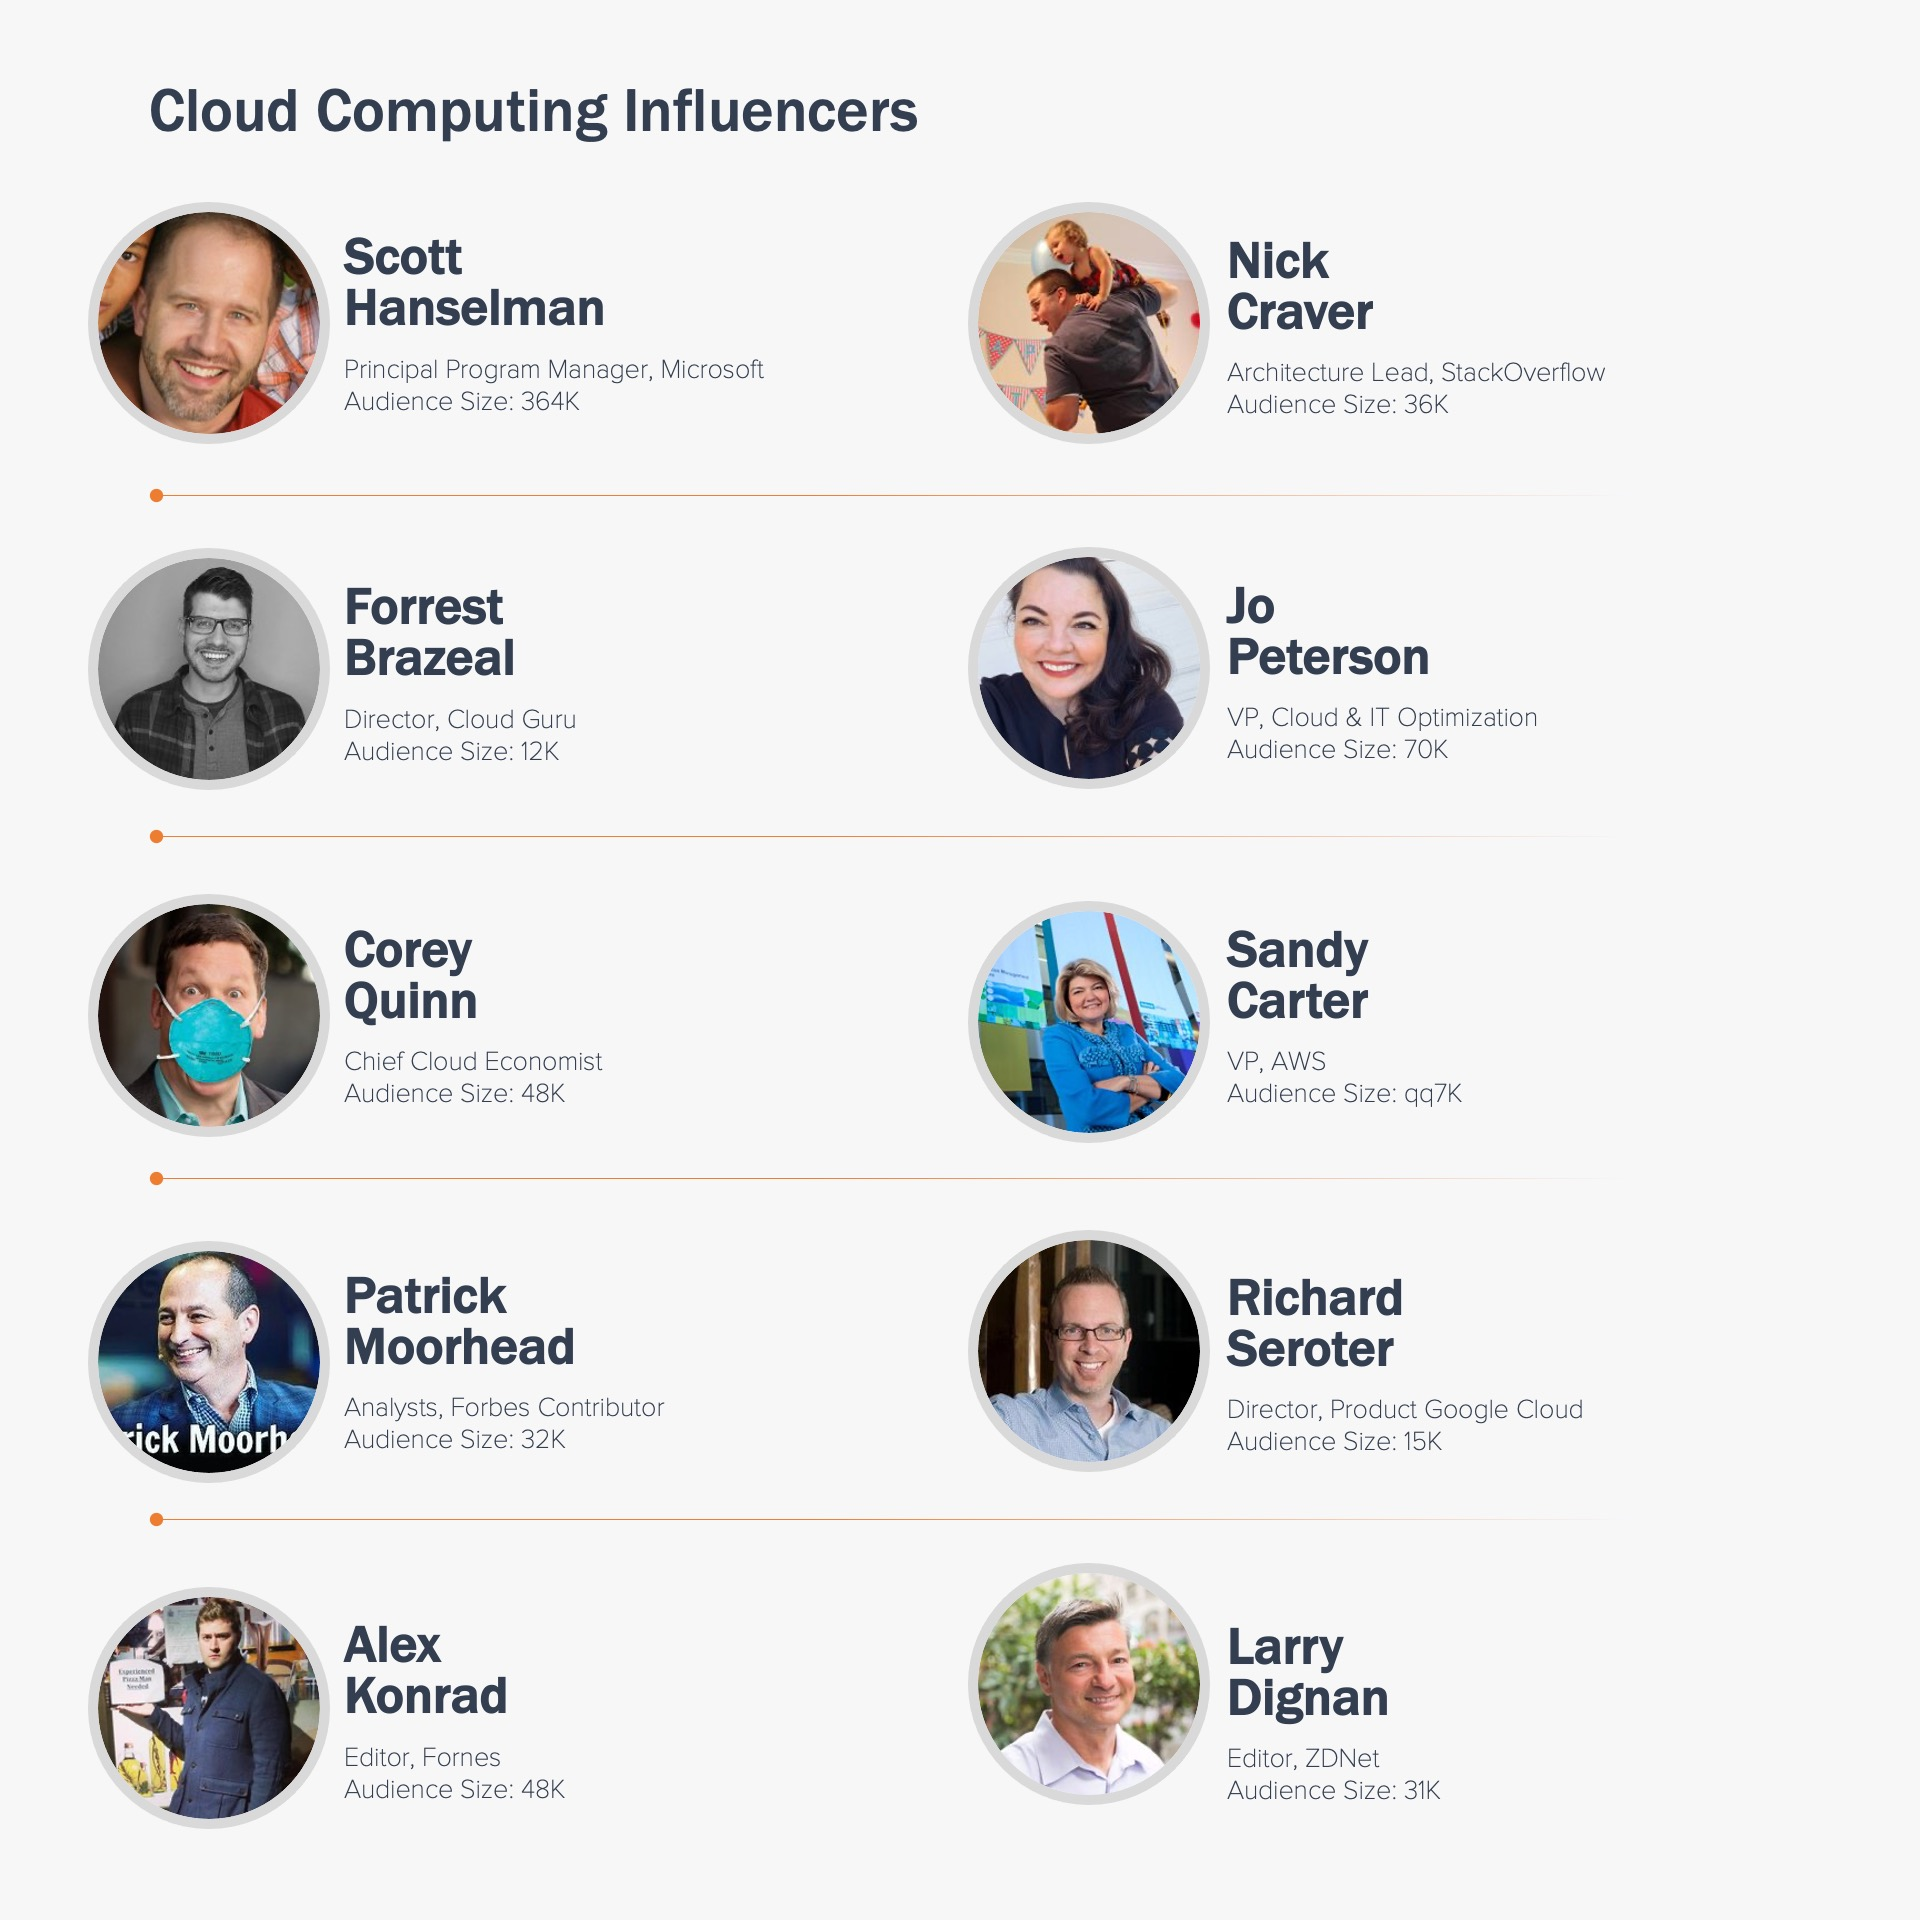 Cloud Computing Influencers